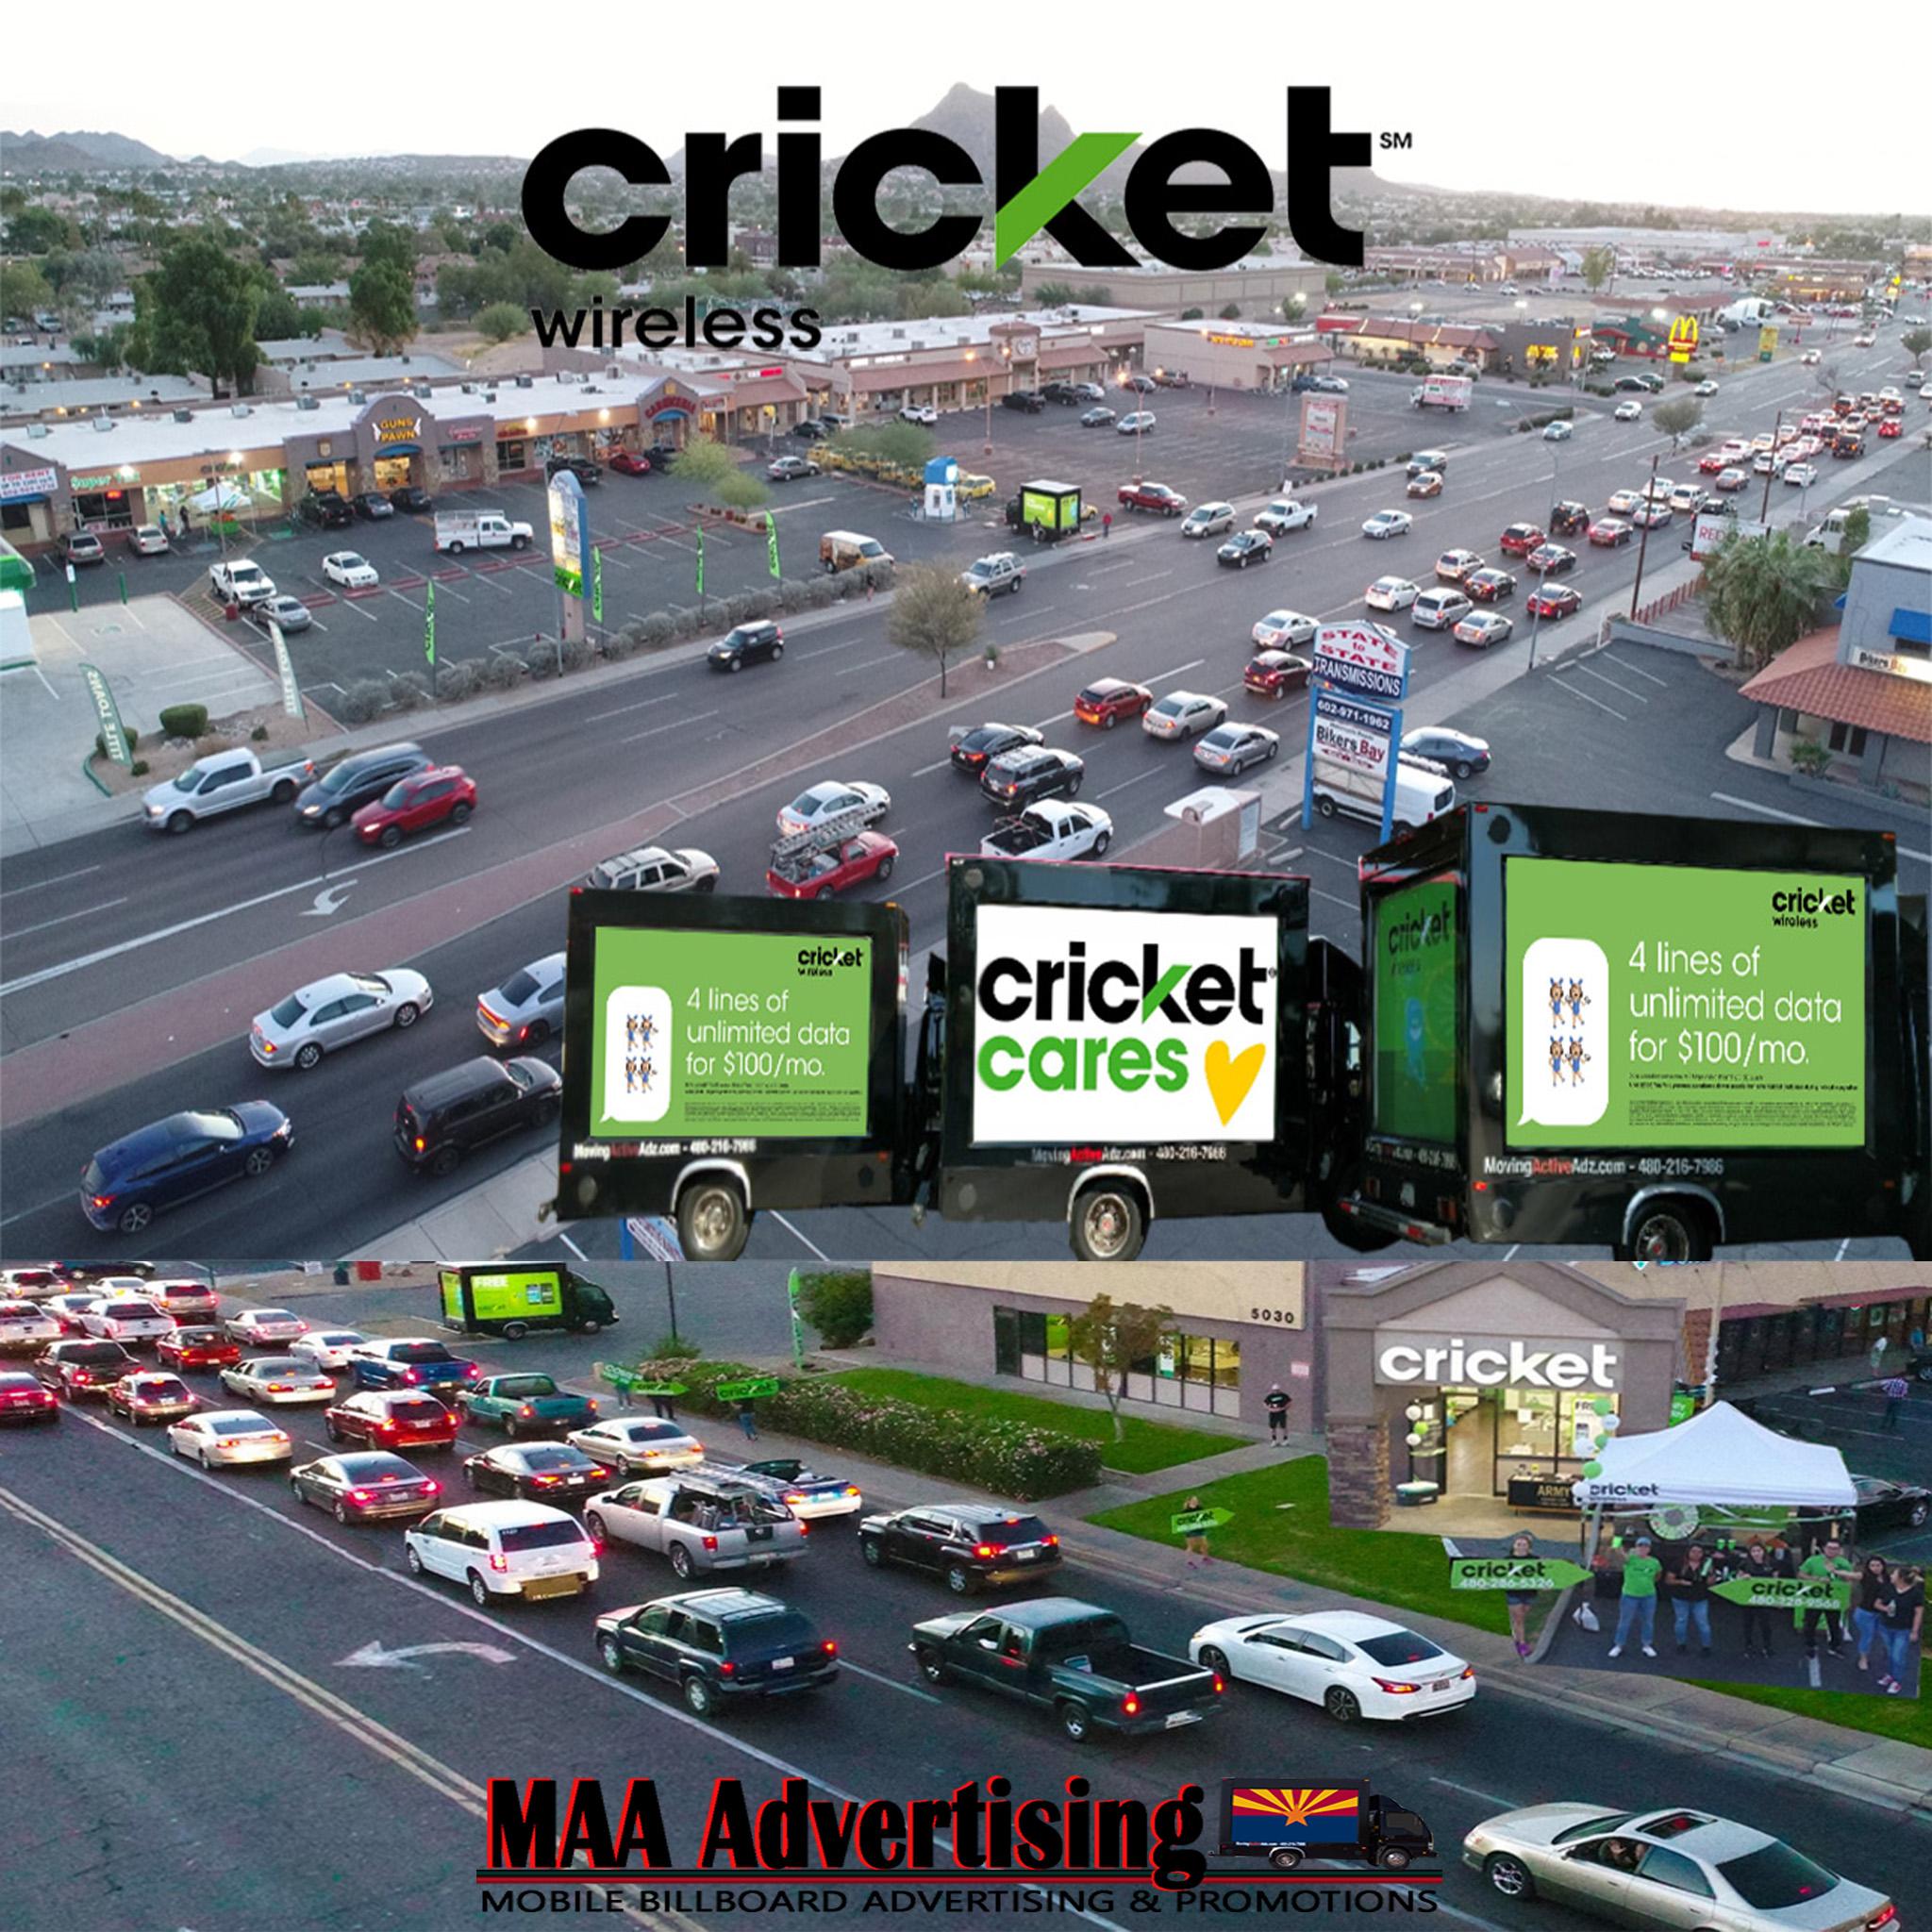 cricket-wireless-retail-stores-mobile-billboard-advertising-promotions-Facebook.jpg